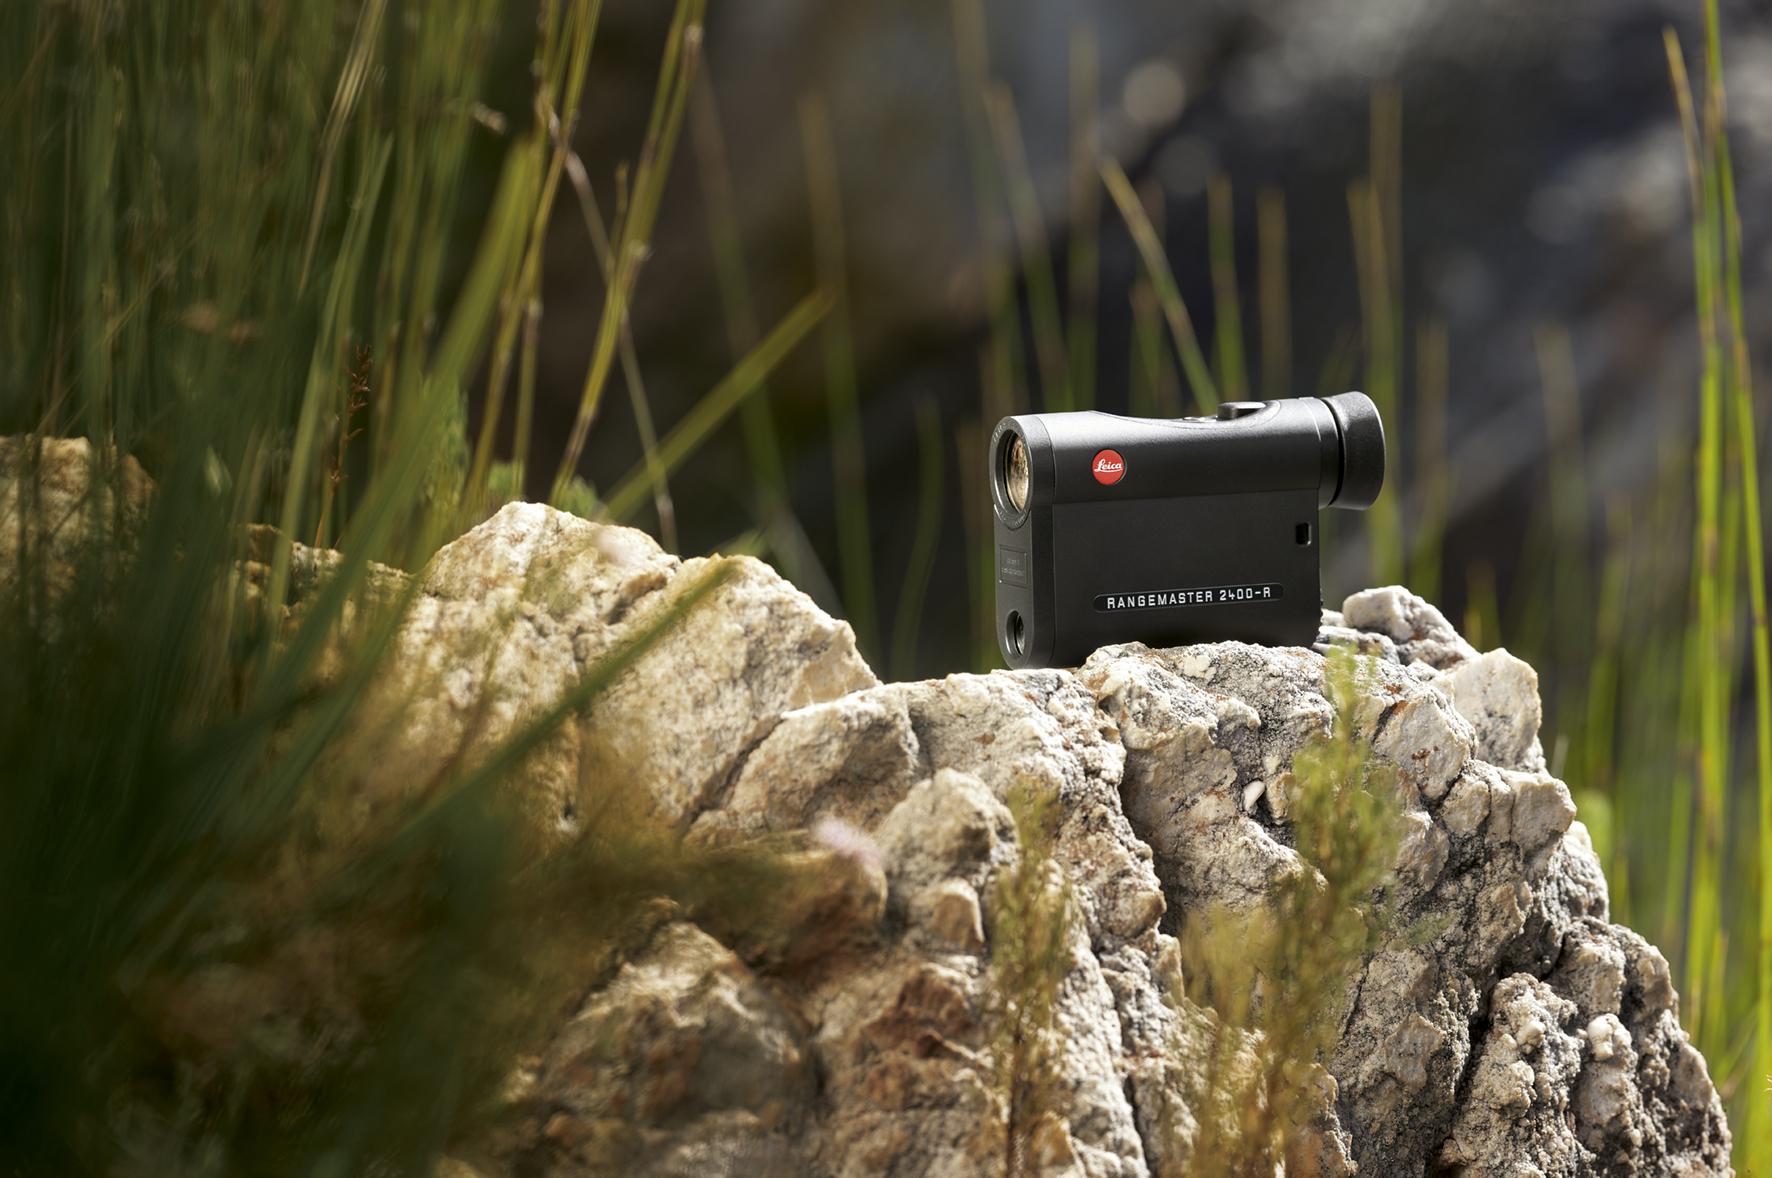 Дальномер Leica Rangemaster CRF 2400-R